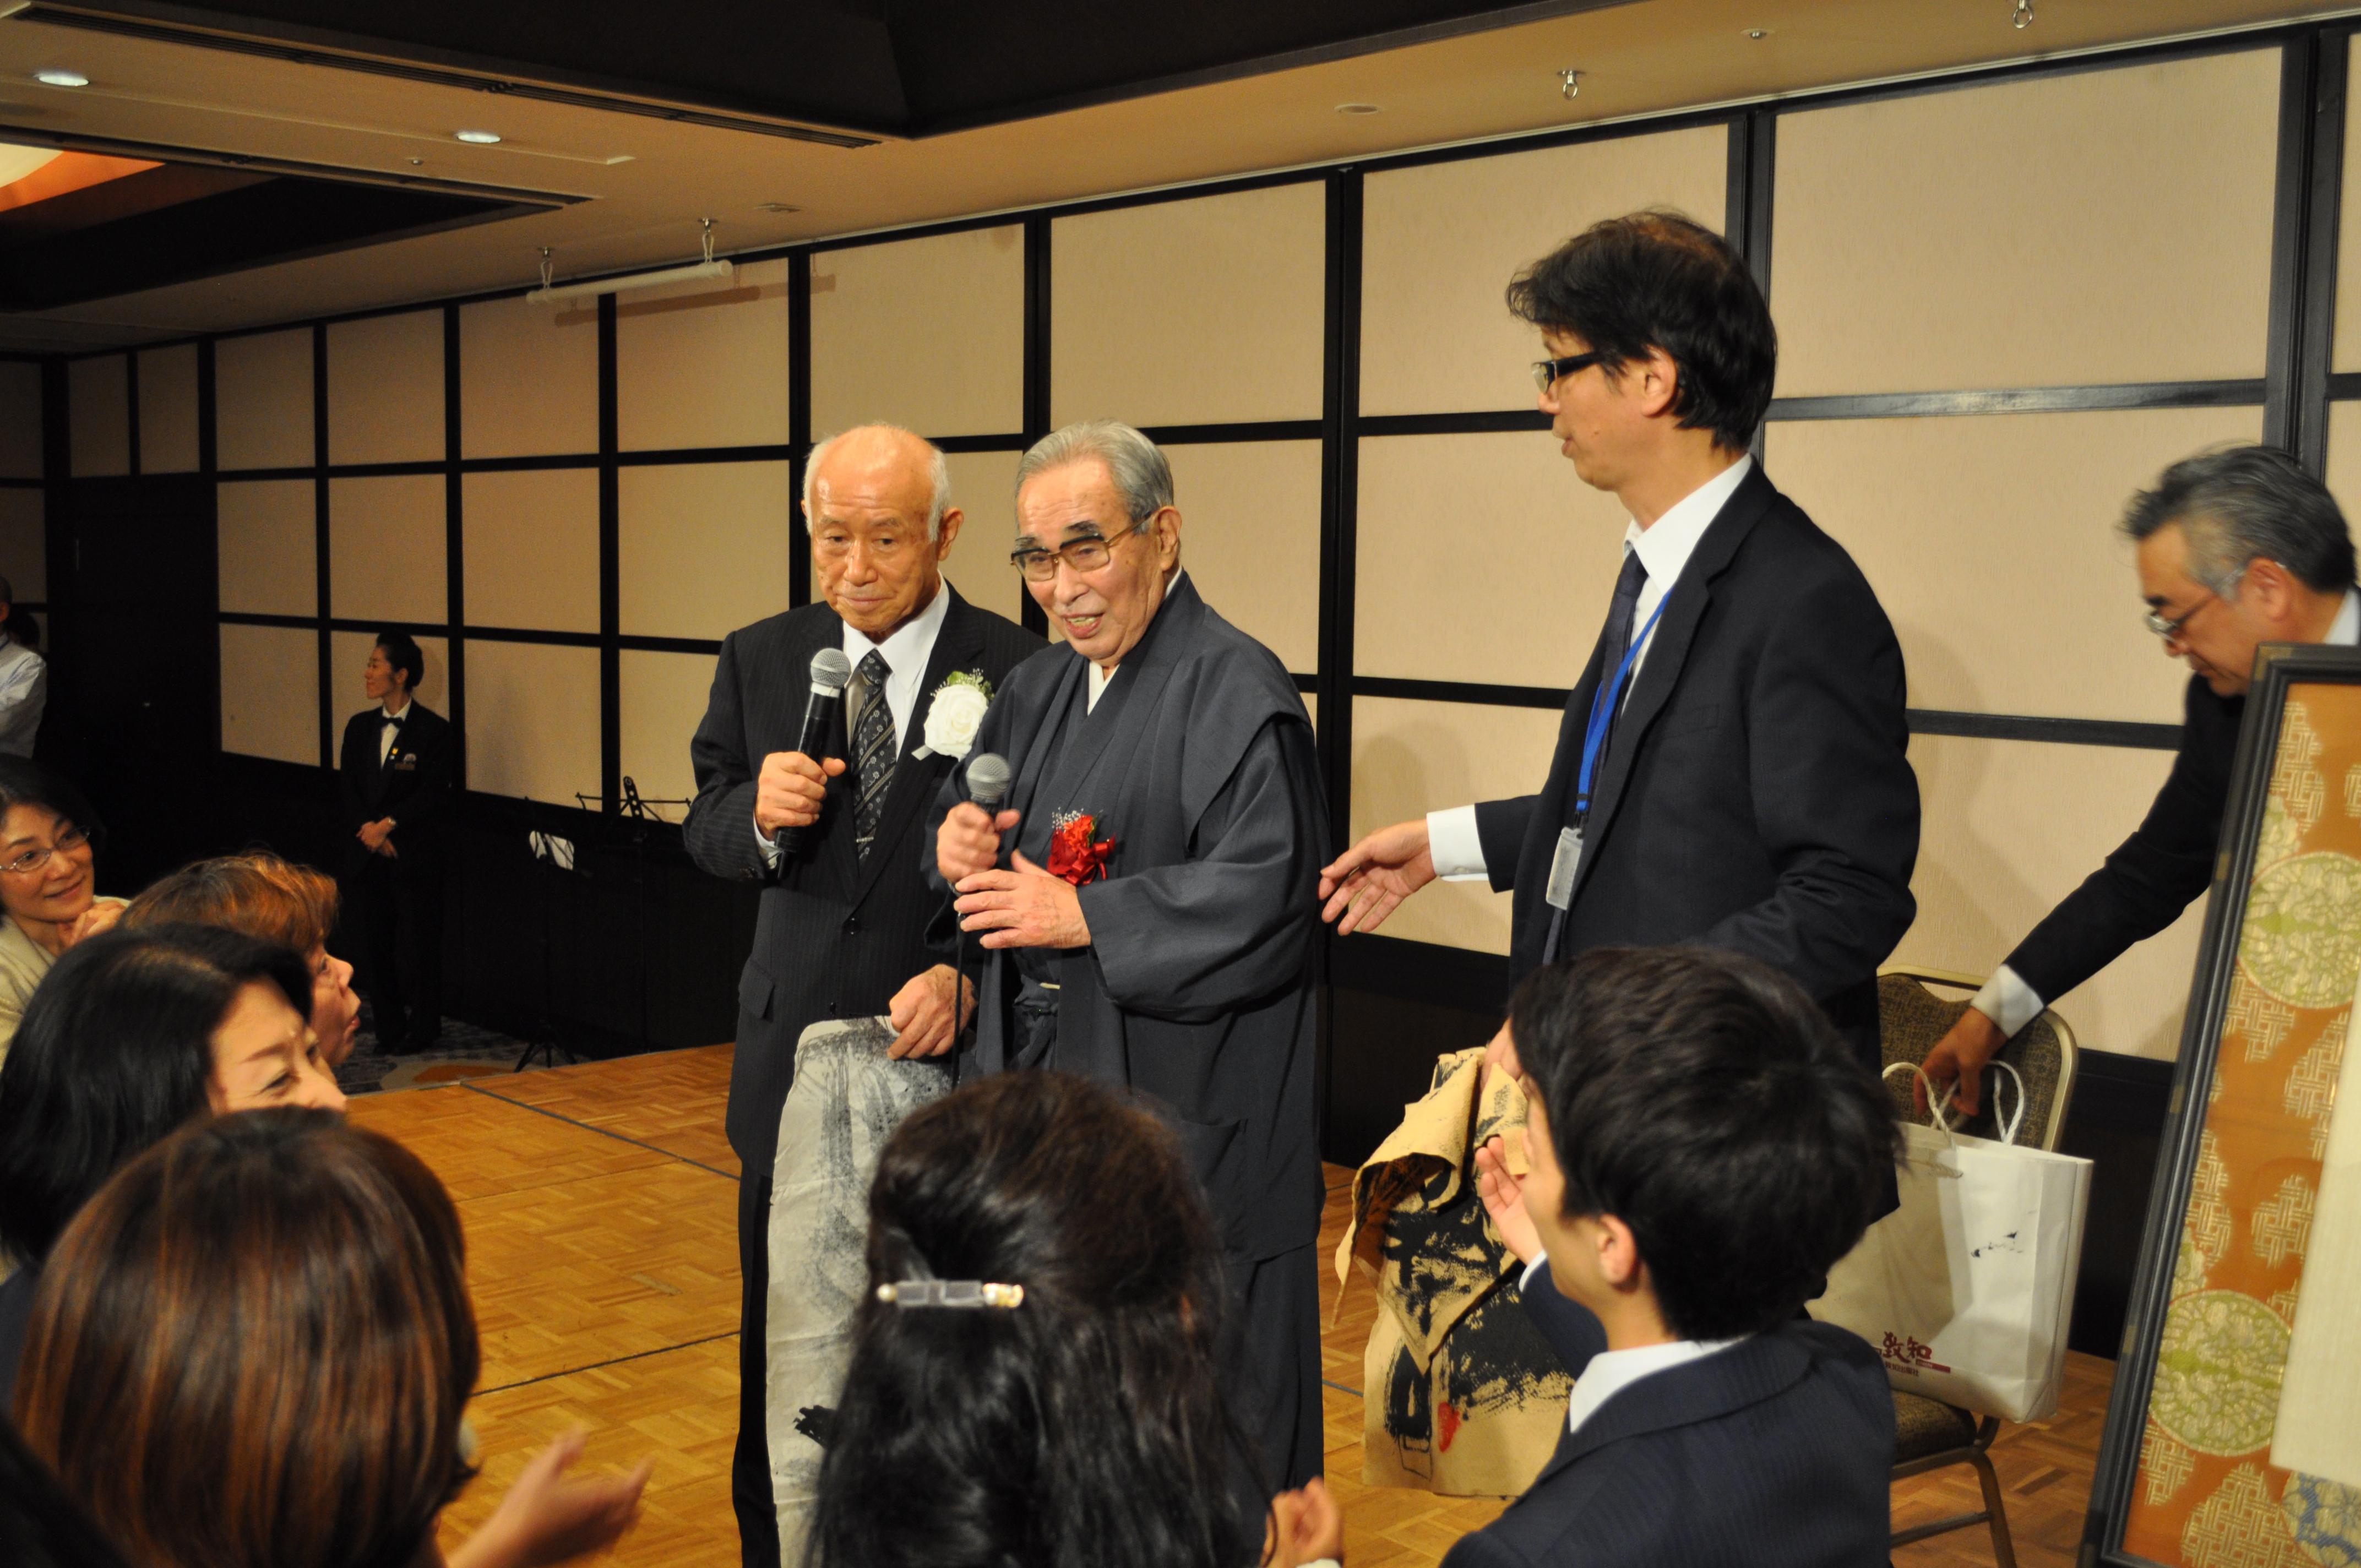 DSC 0596 - 第6回思風会全国大会2018in東京開催